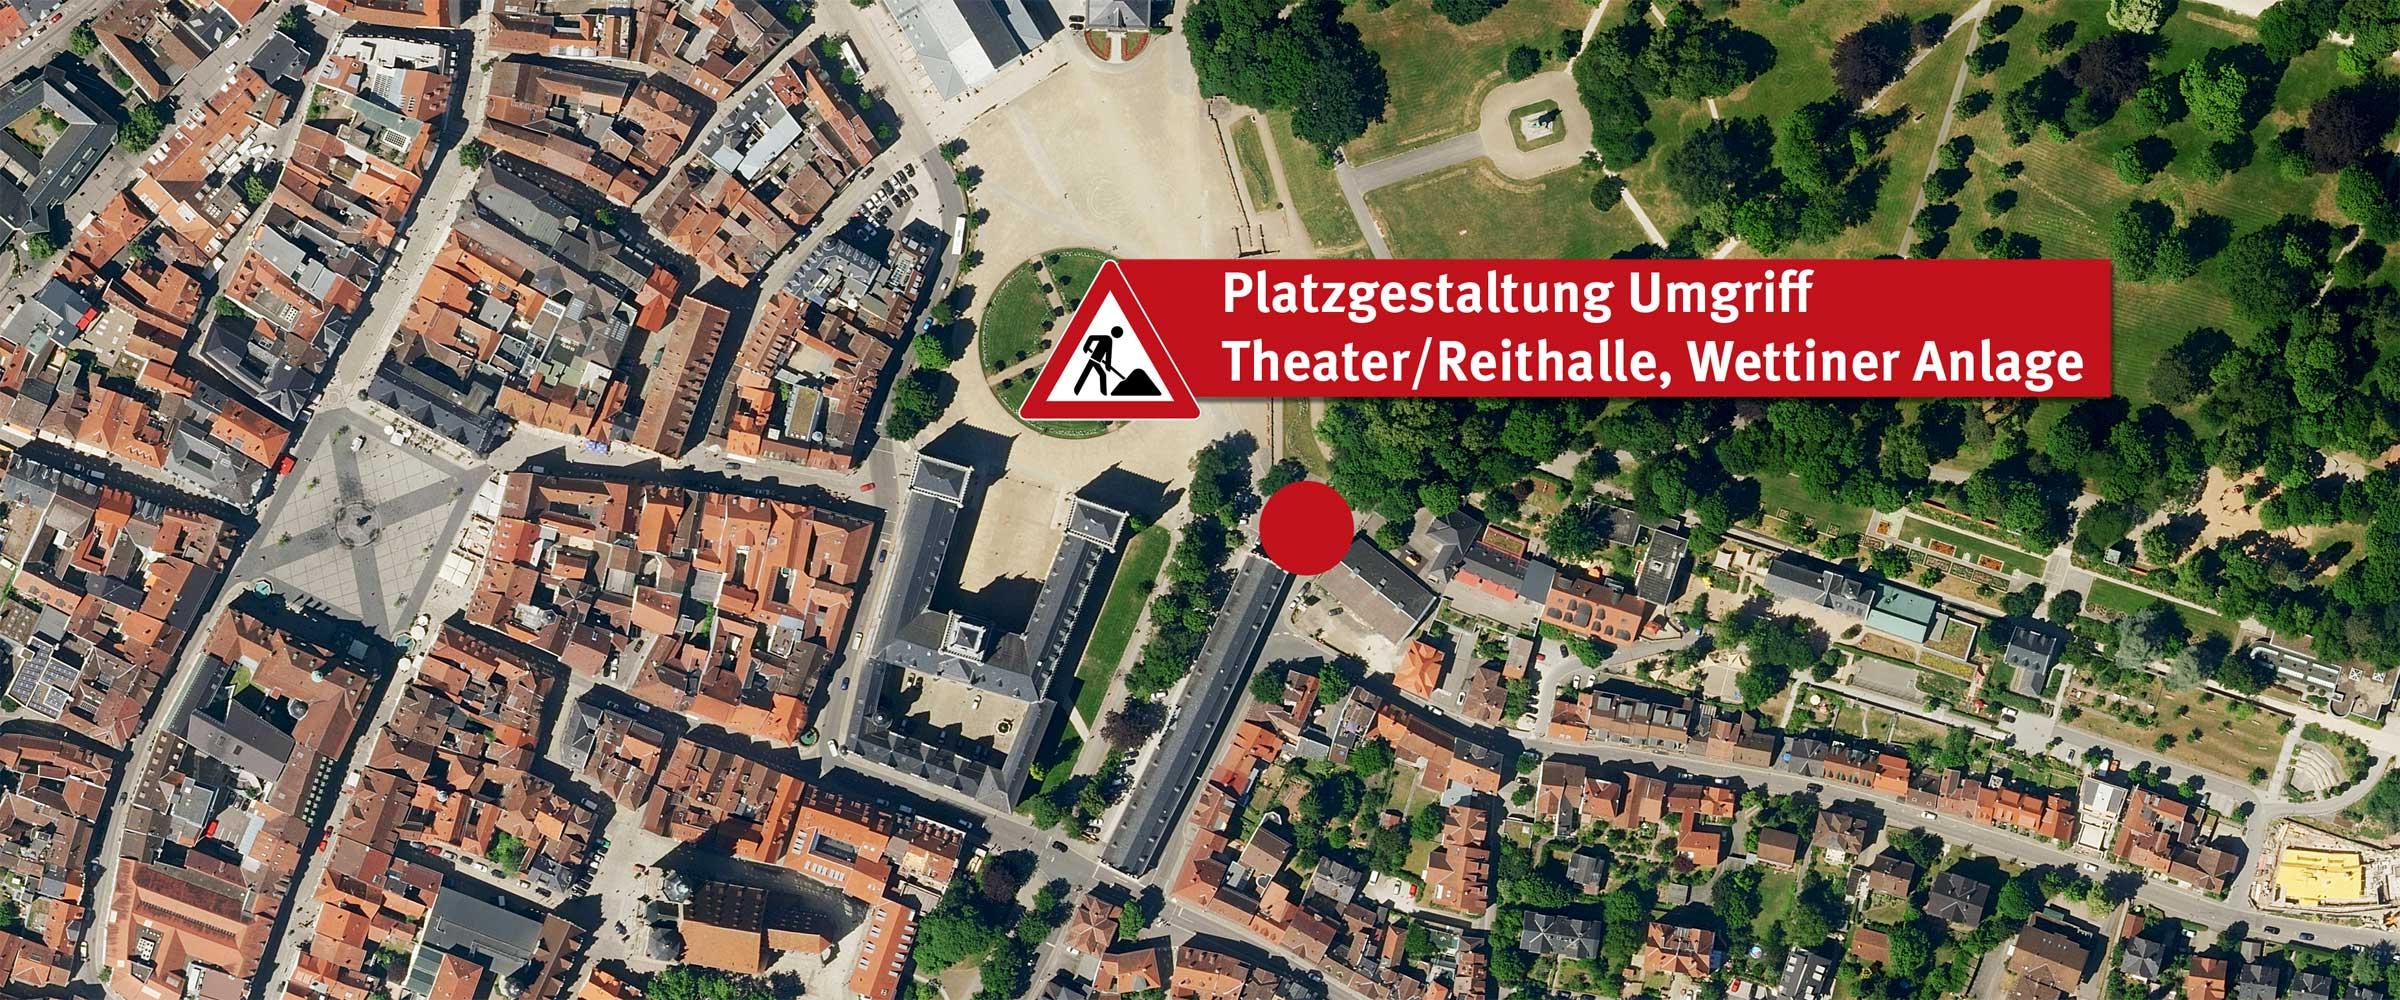 banner_reithalle